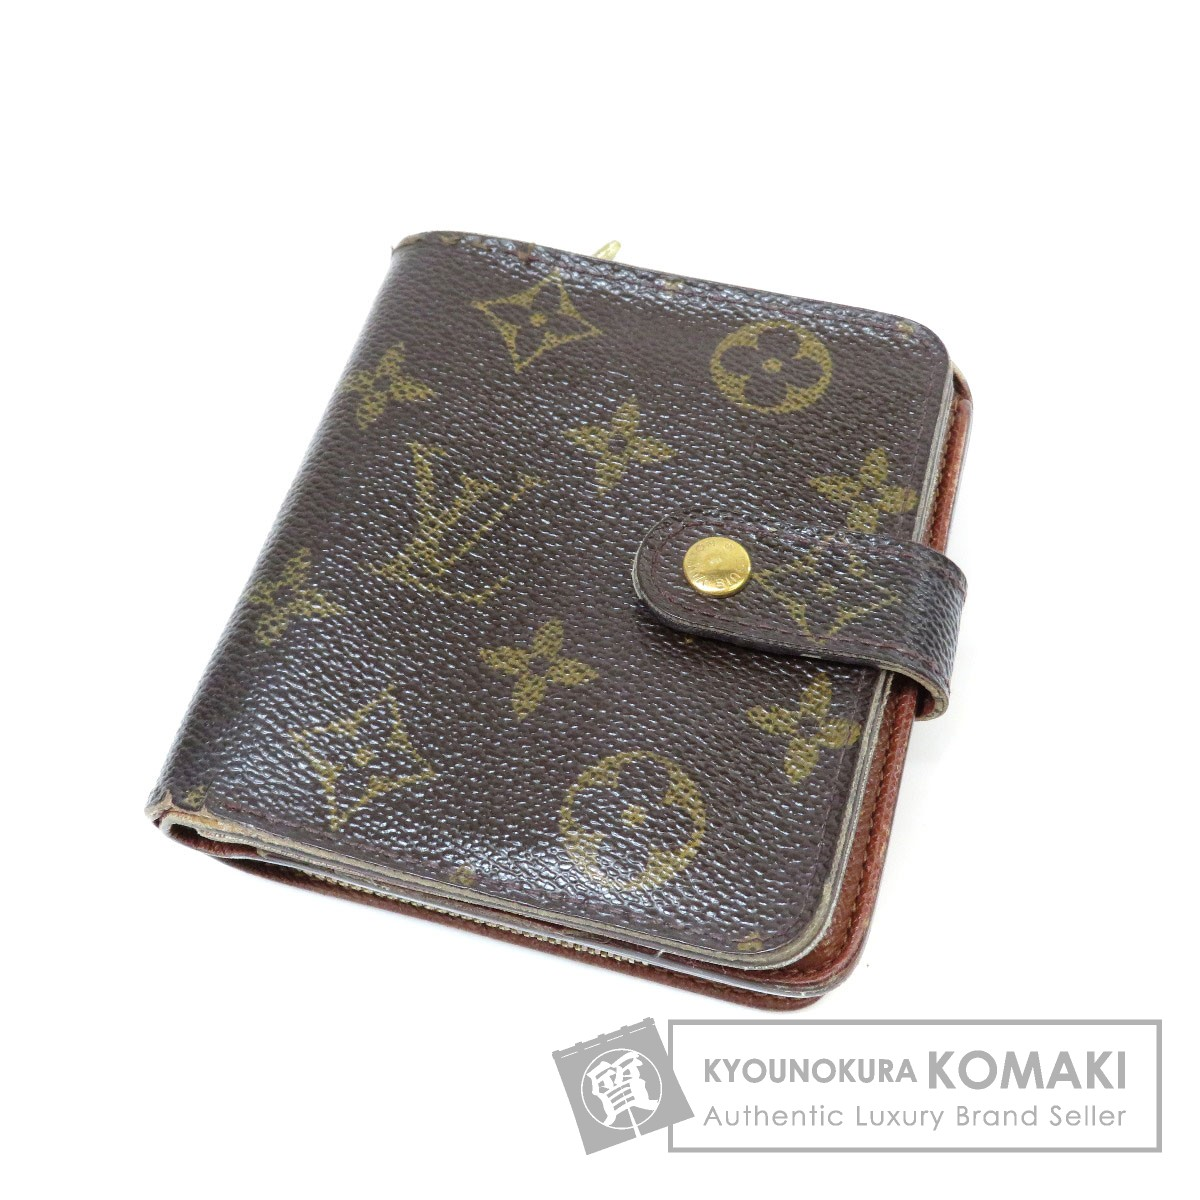 e754c4e14e1f Authentic LOUIS VUITTON M61667 Compact zip Bifold Wallet with Coin Pocket  Monogram canvas